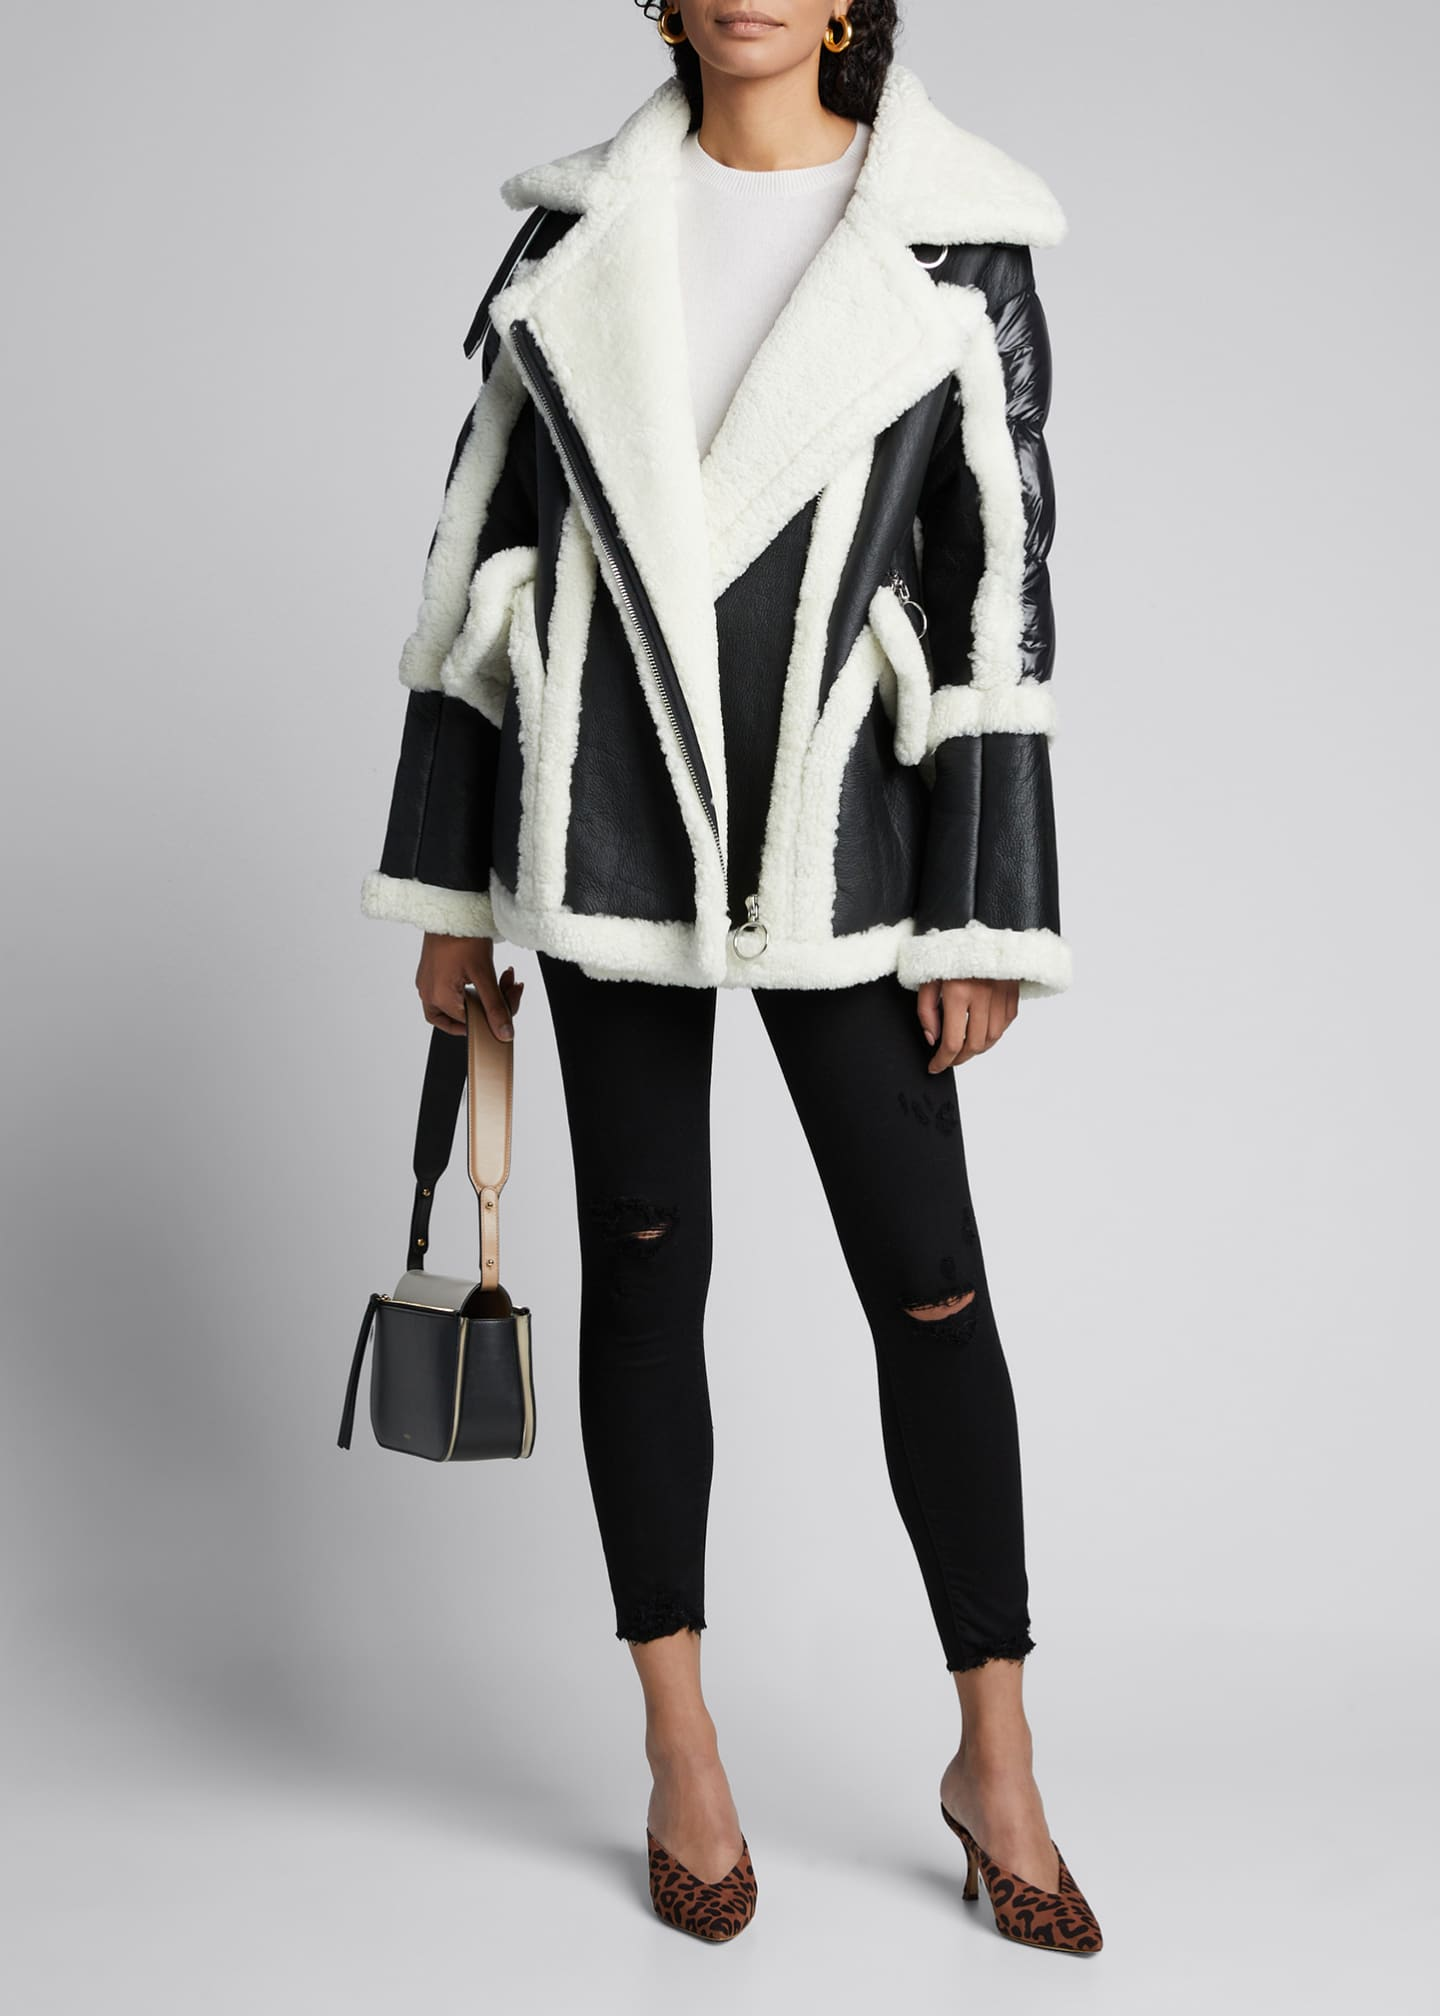 Nicole Benisti Montaigne Shearling Puffer-Back Coat